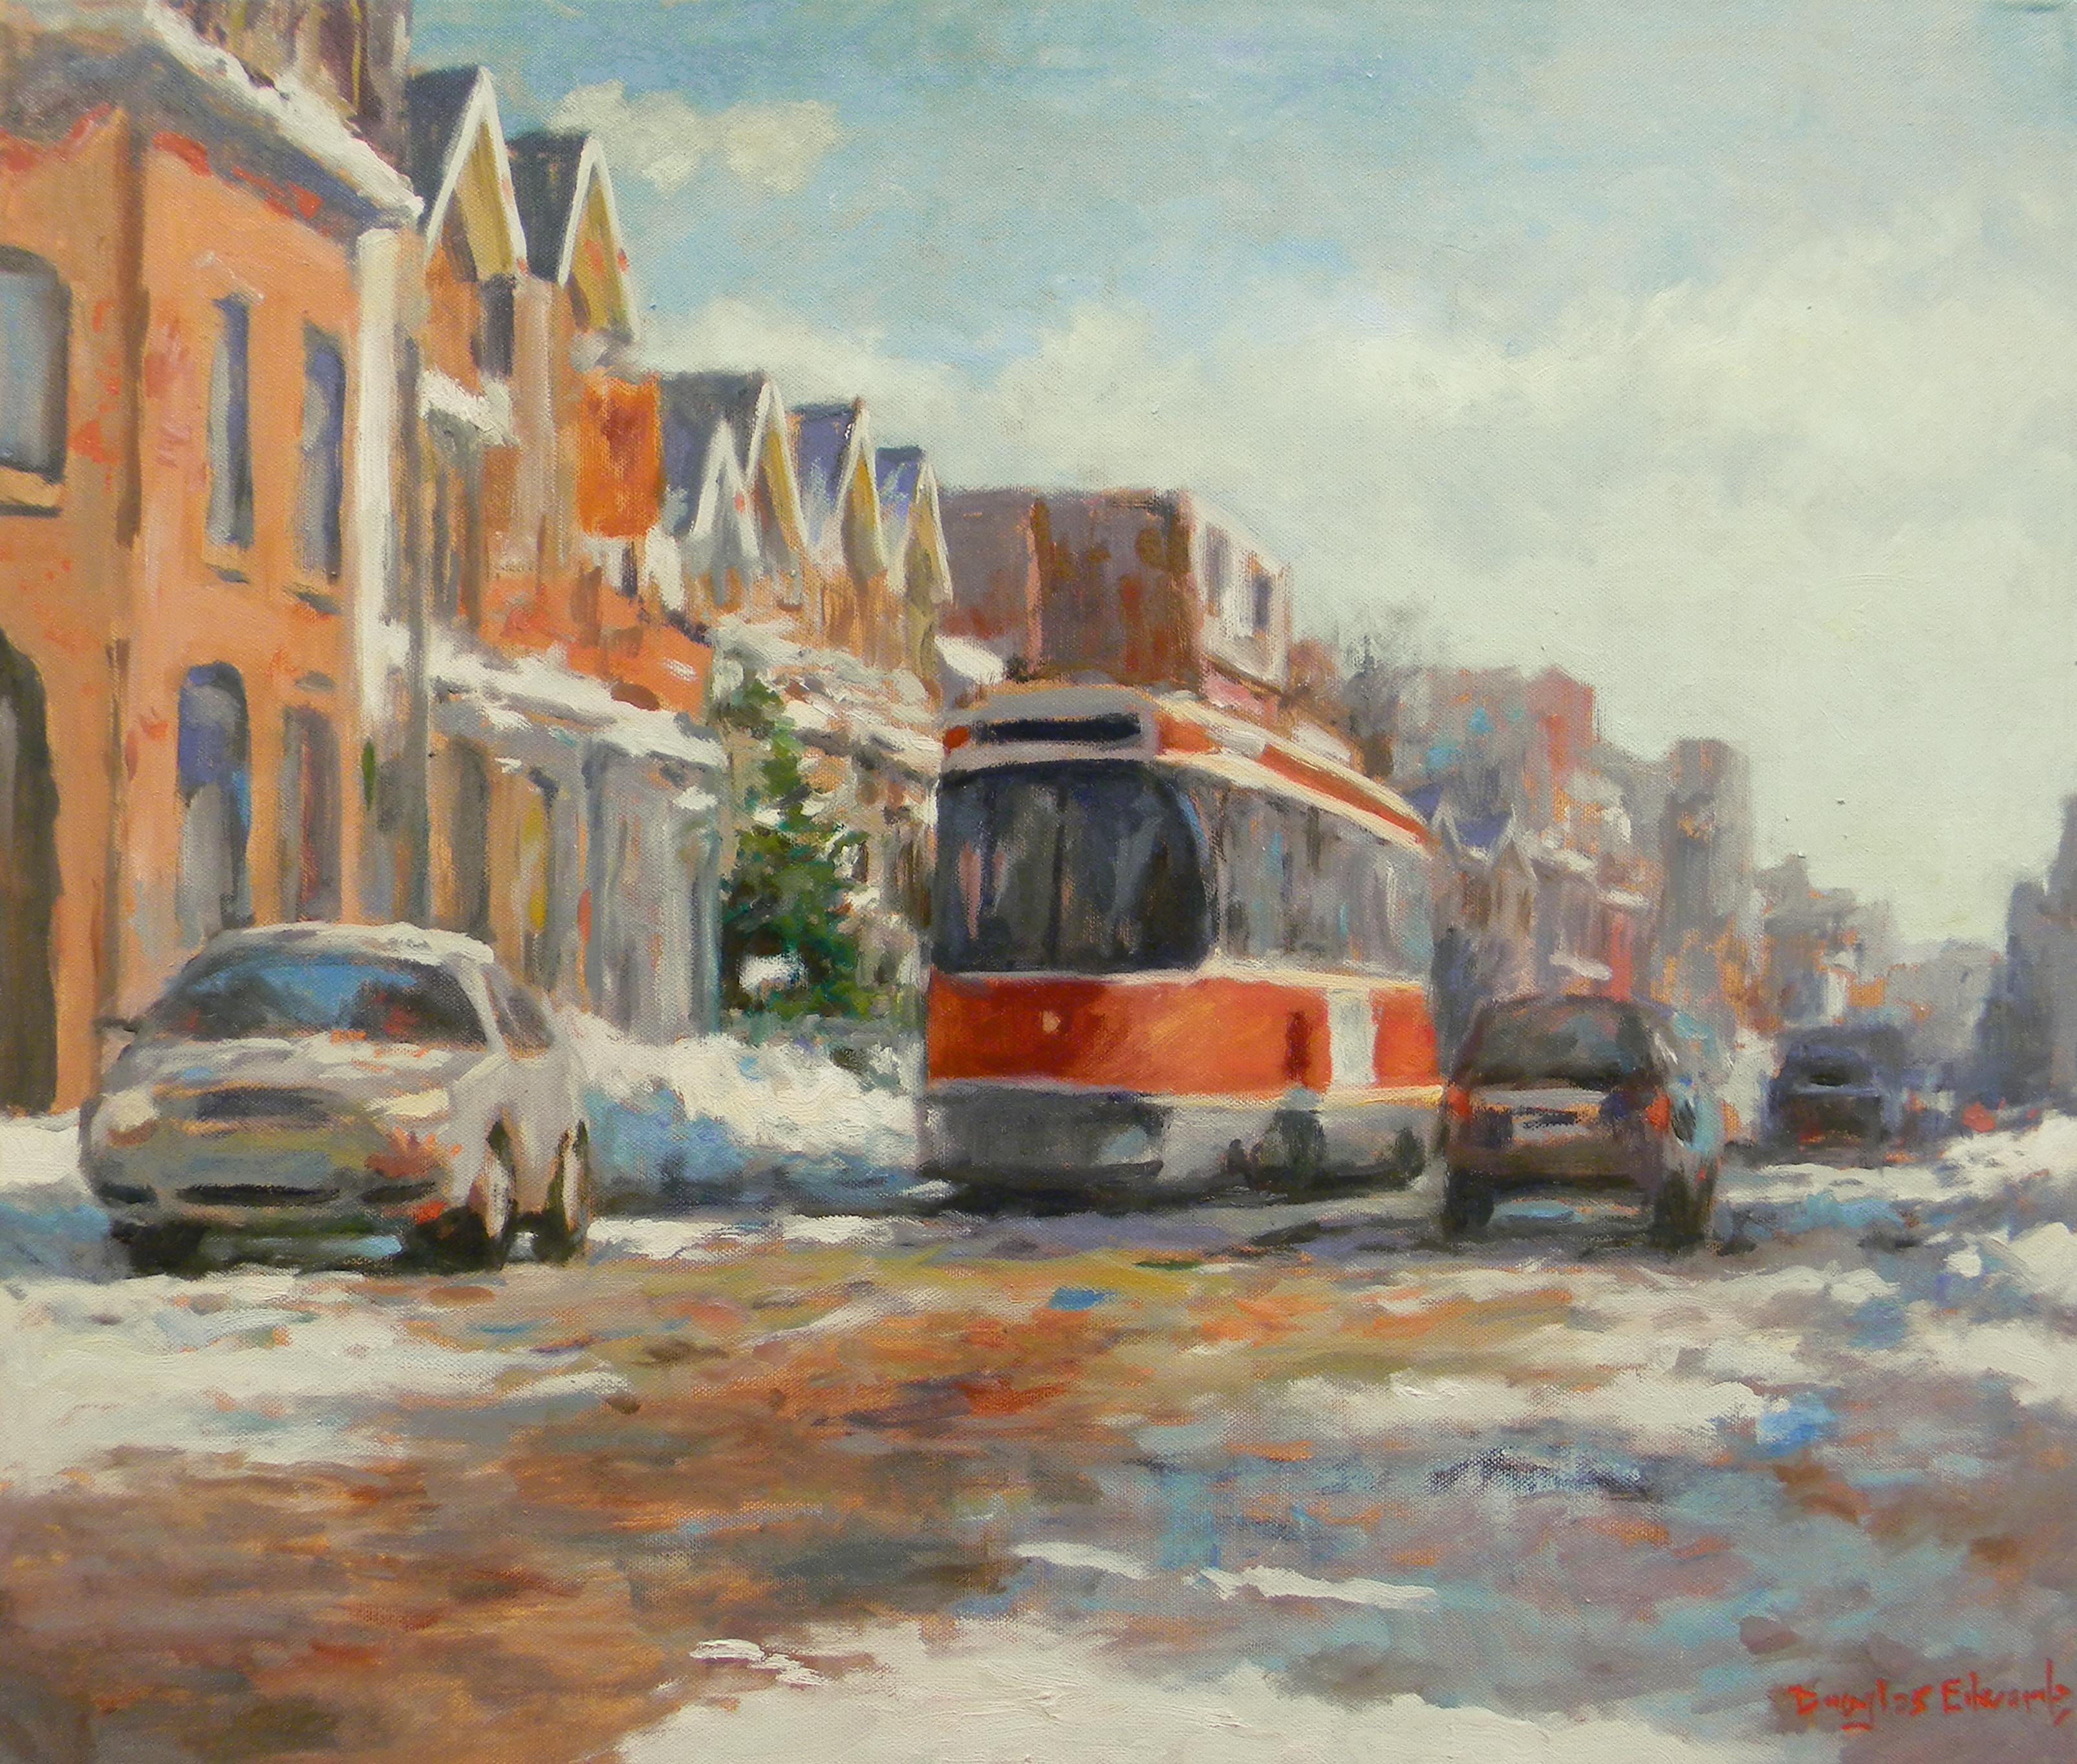 Streetcar - Gerrard